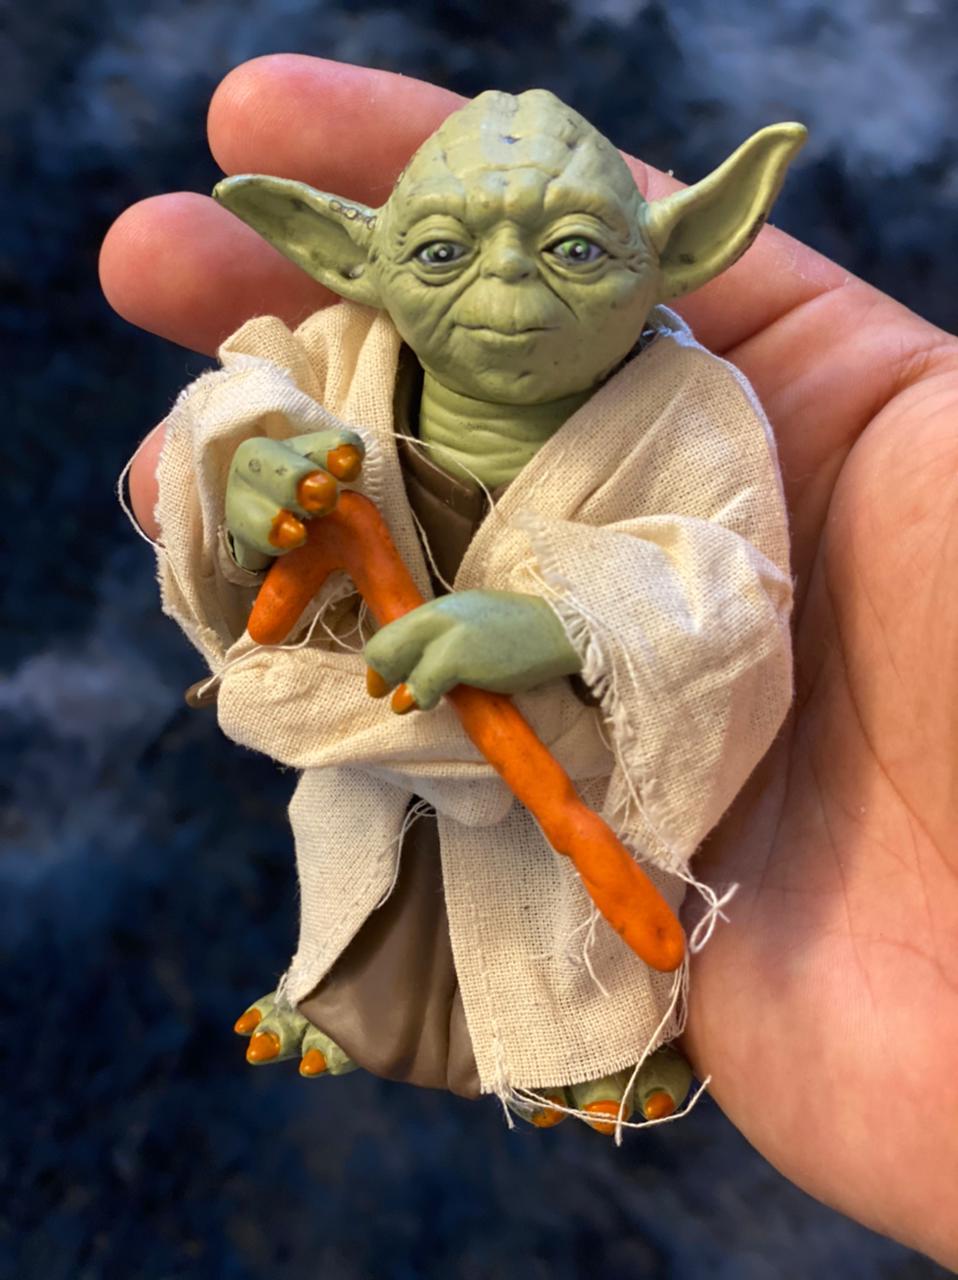 Action Figure Mestre Yoda: Star Wars Escala 1/6 - EVALI